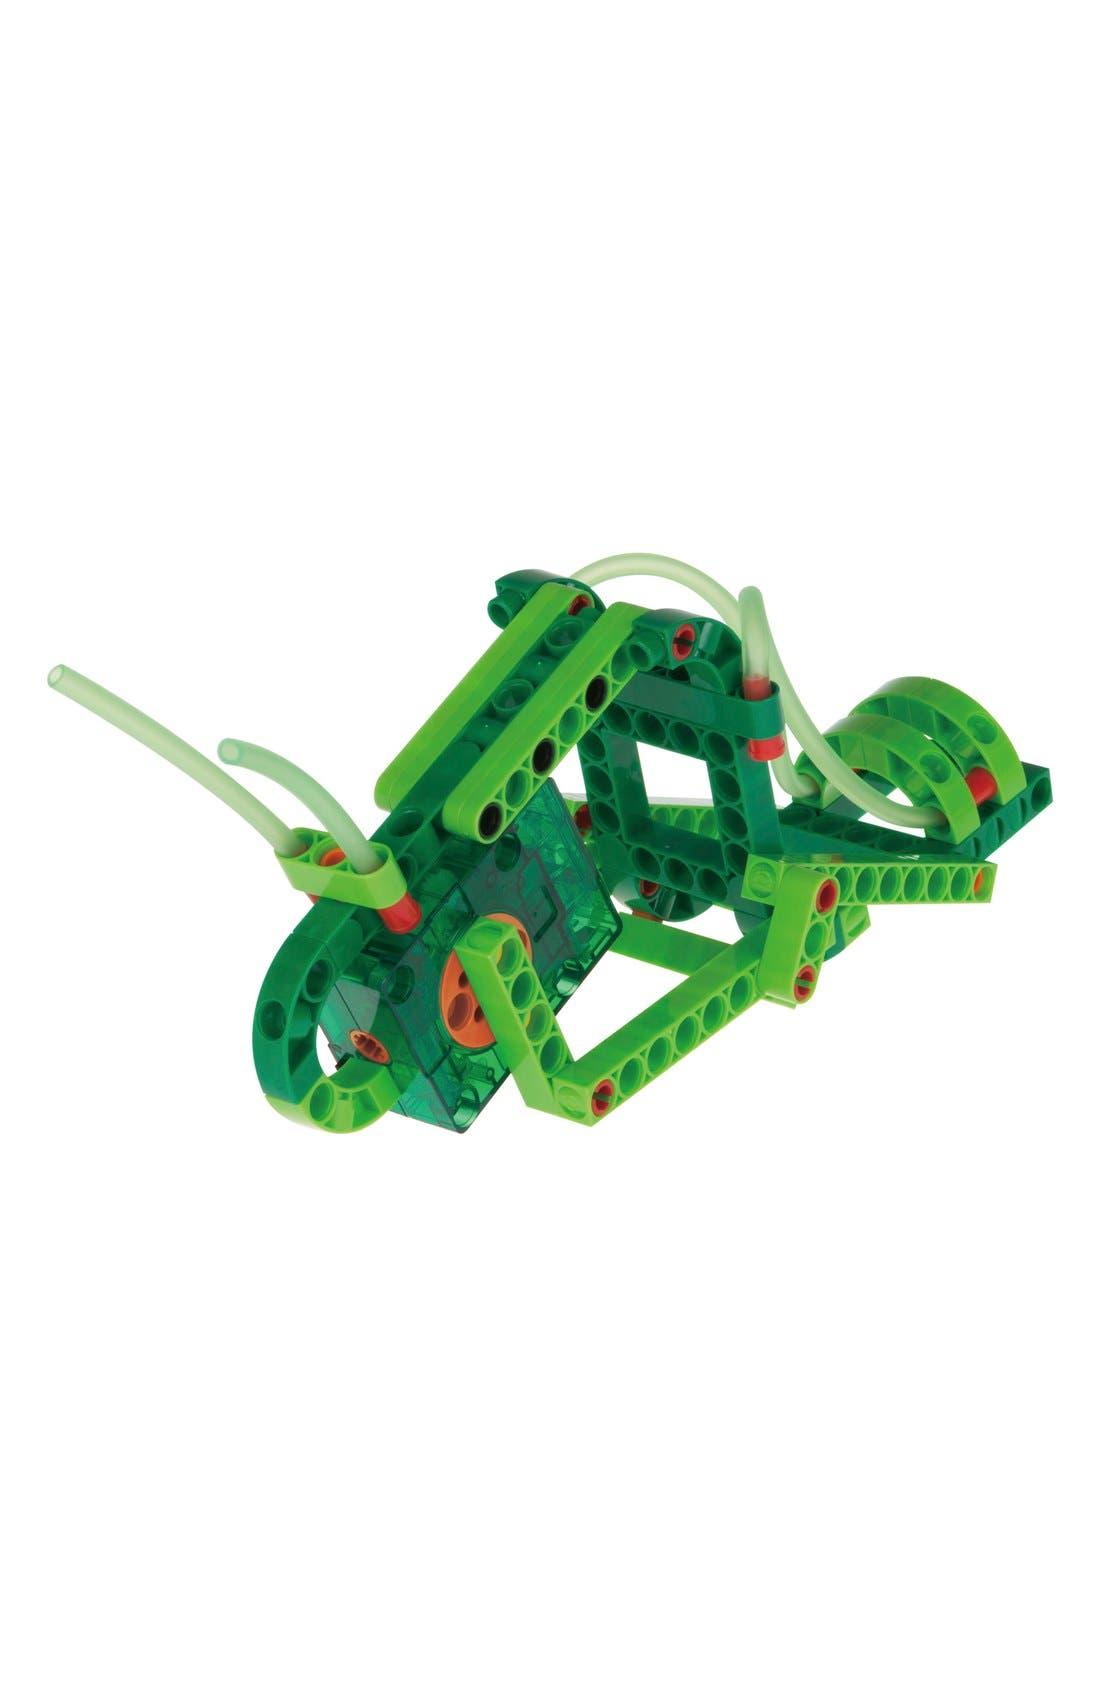 'Geckobot' Robotics Experiment Kit,                             Alternate thumbnail 5, color,                             301